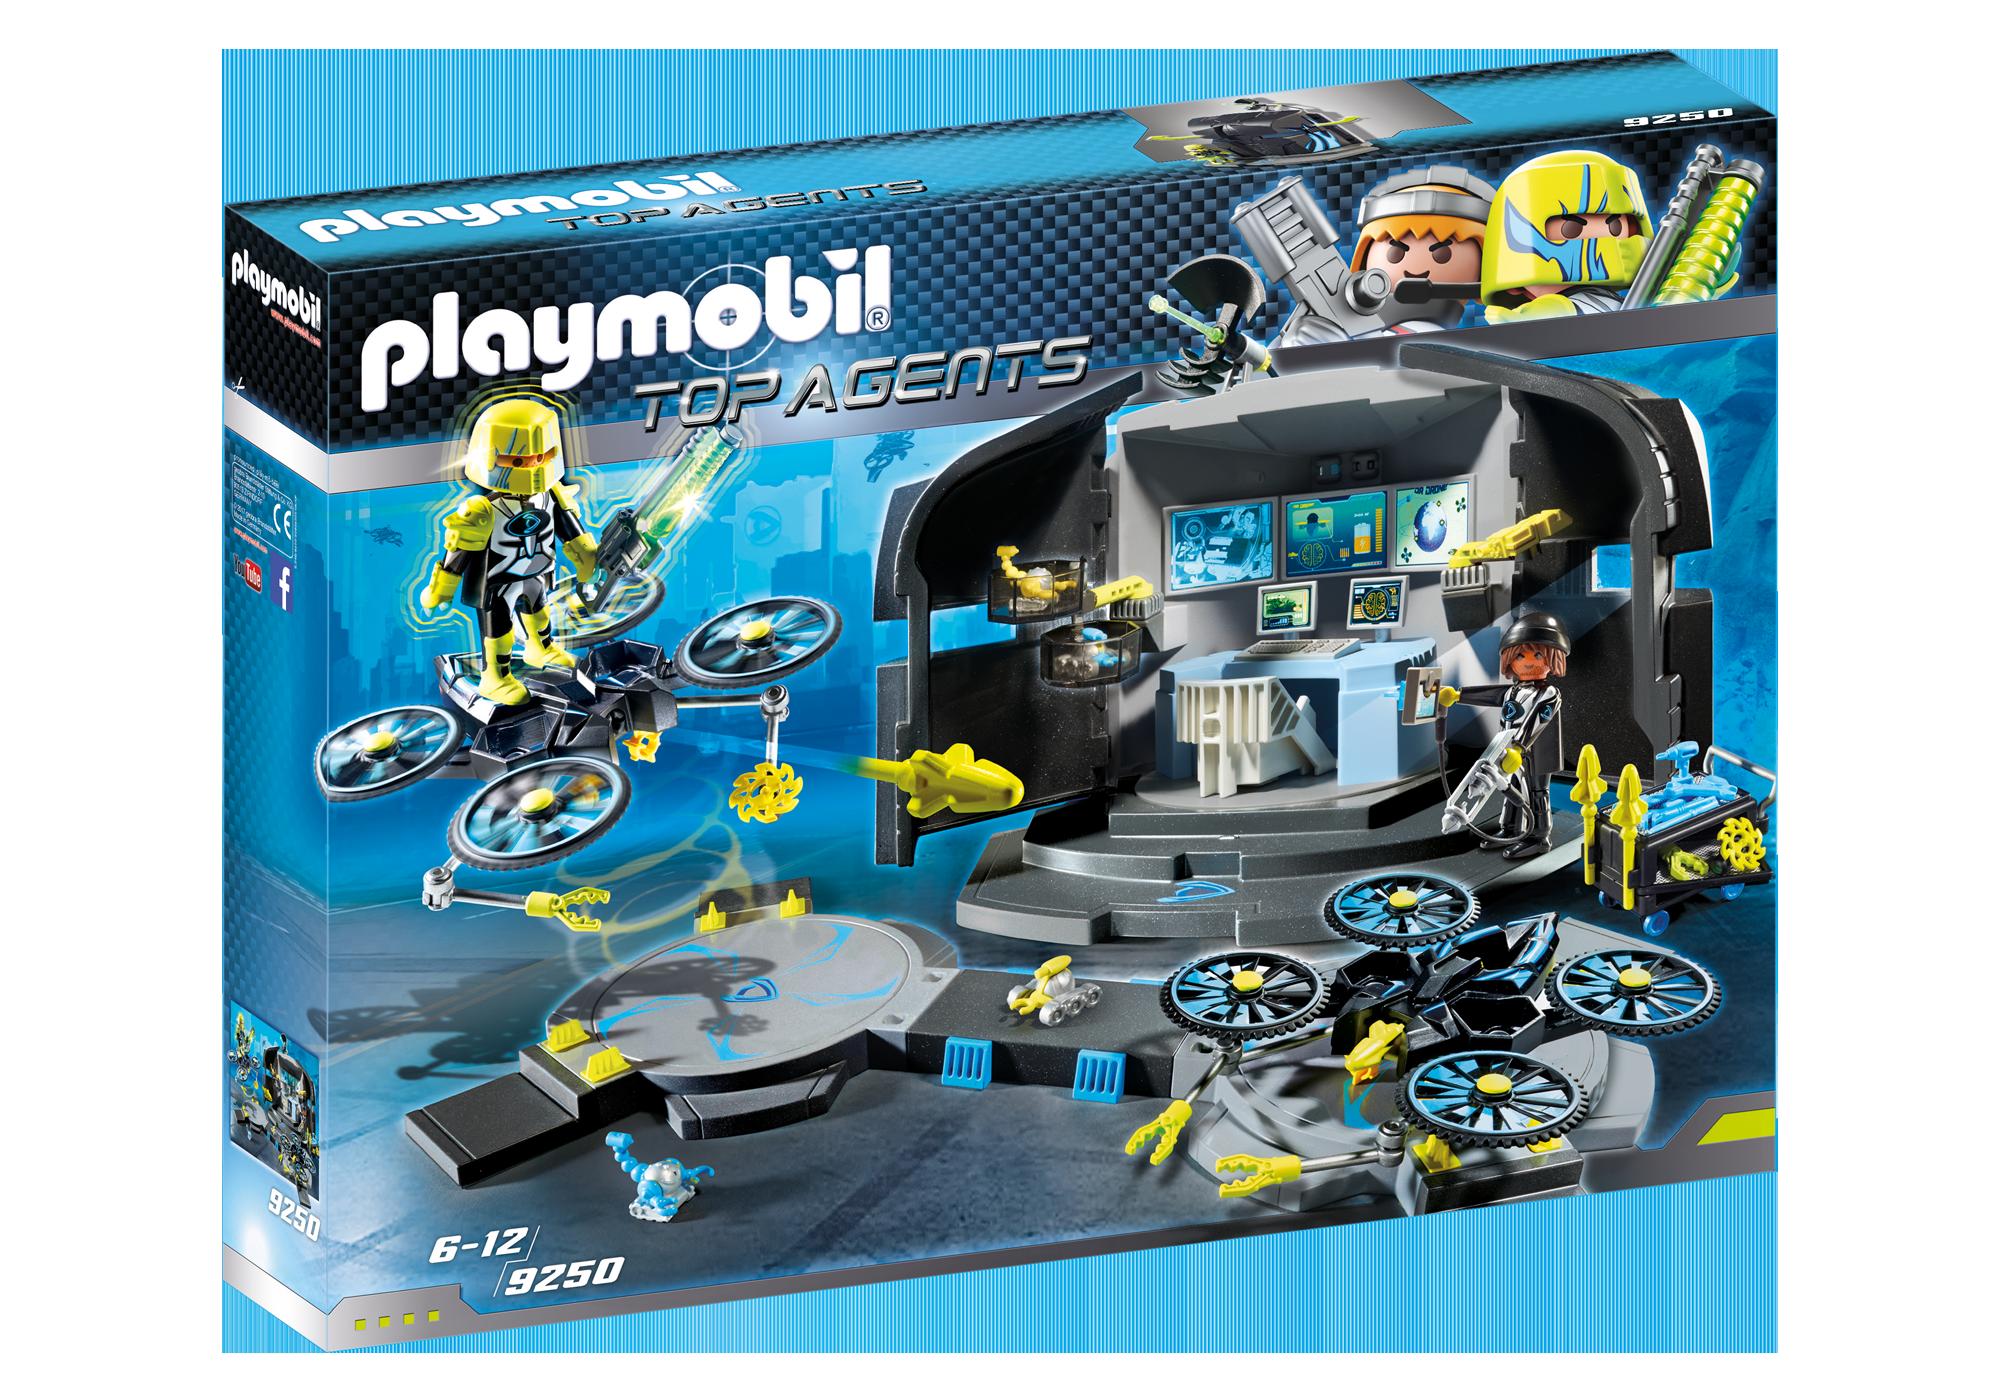 http://media.playmobil.com/i/playmobil/9250_product_box_front/Centro de Mando del Dr.Drone